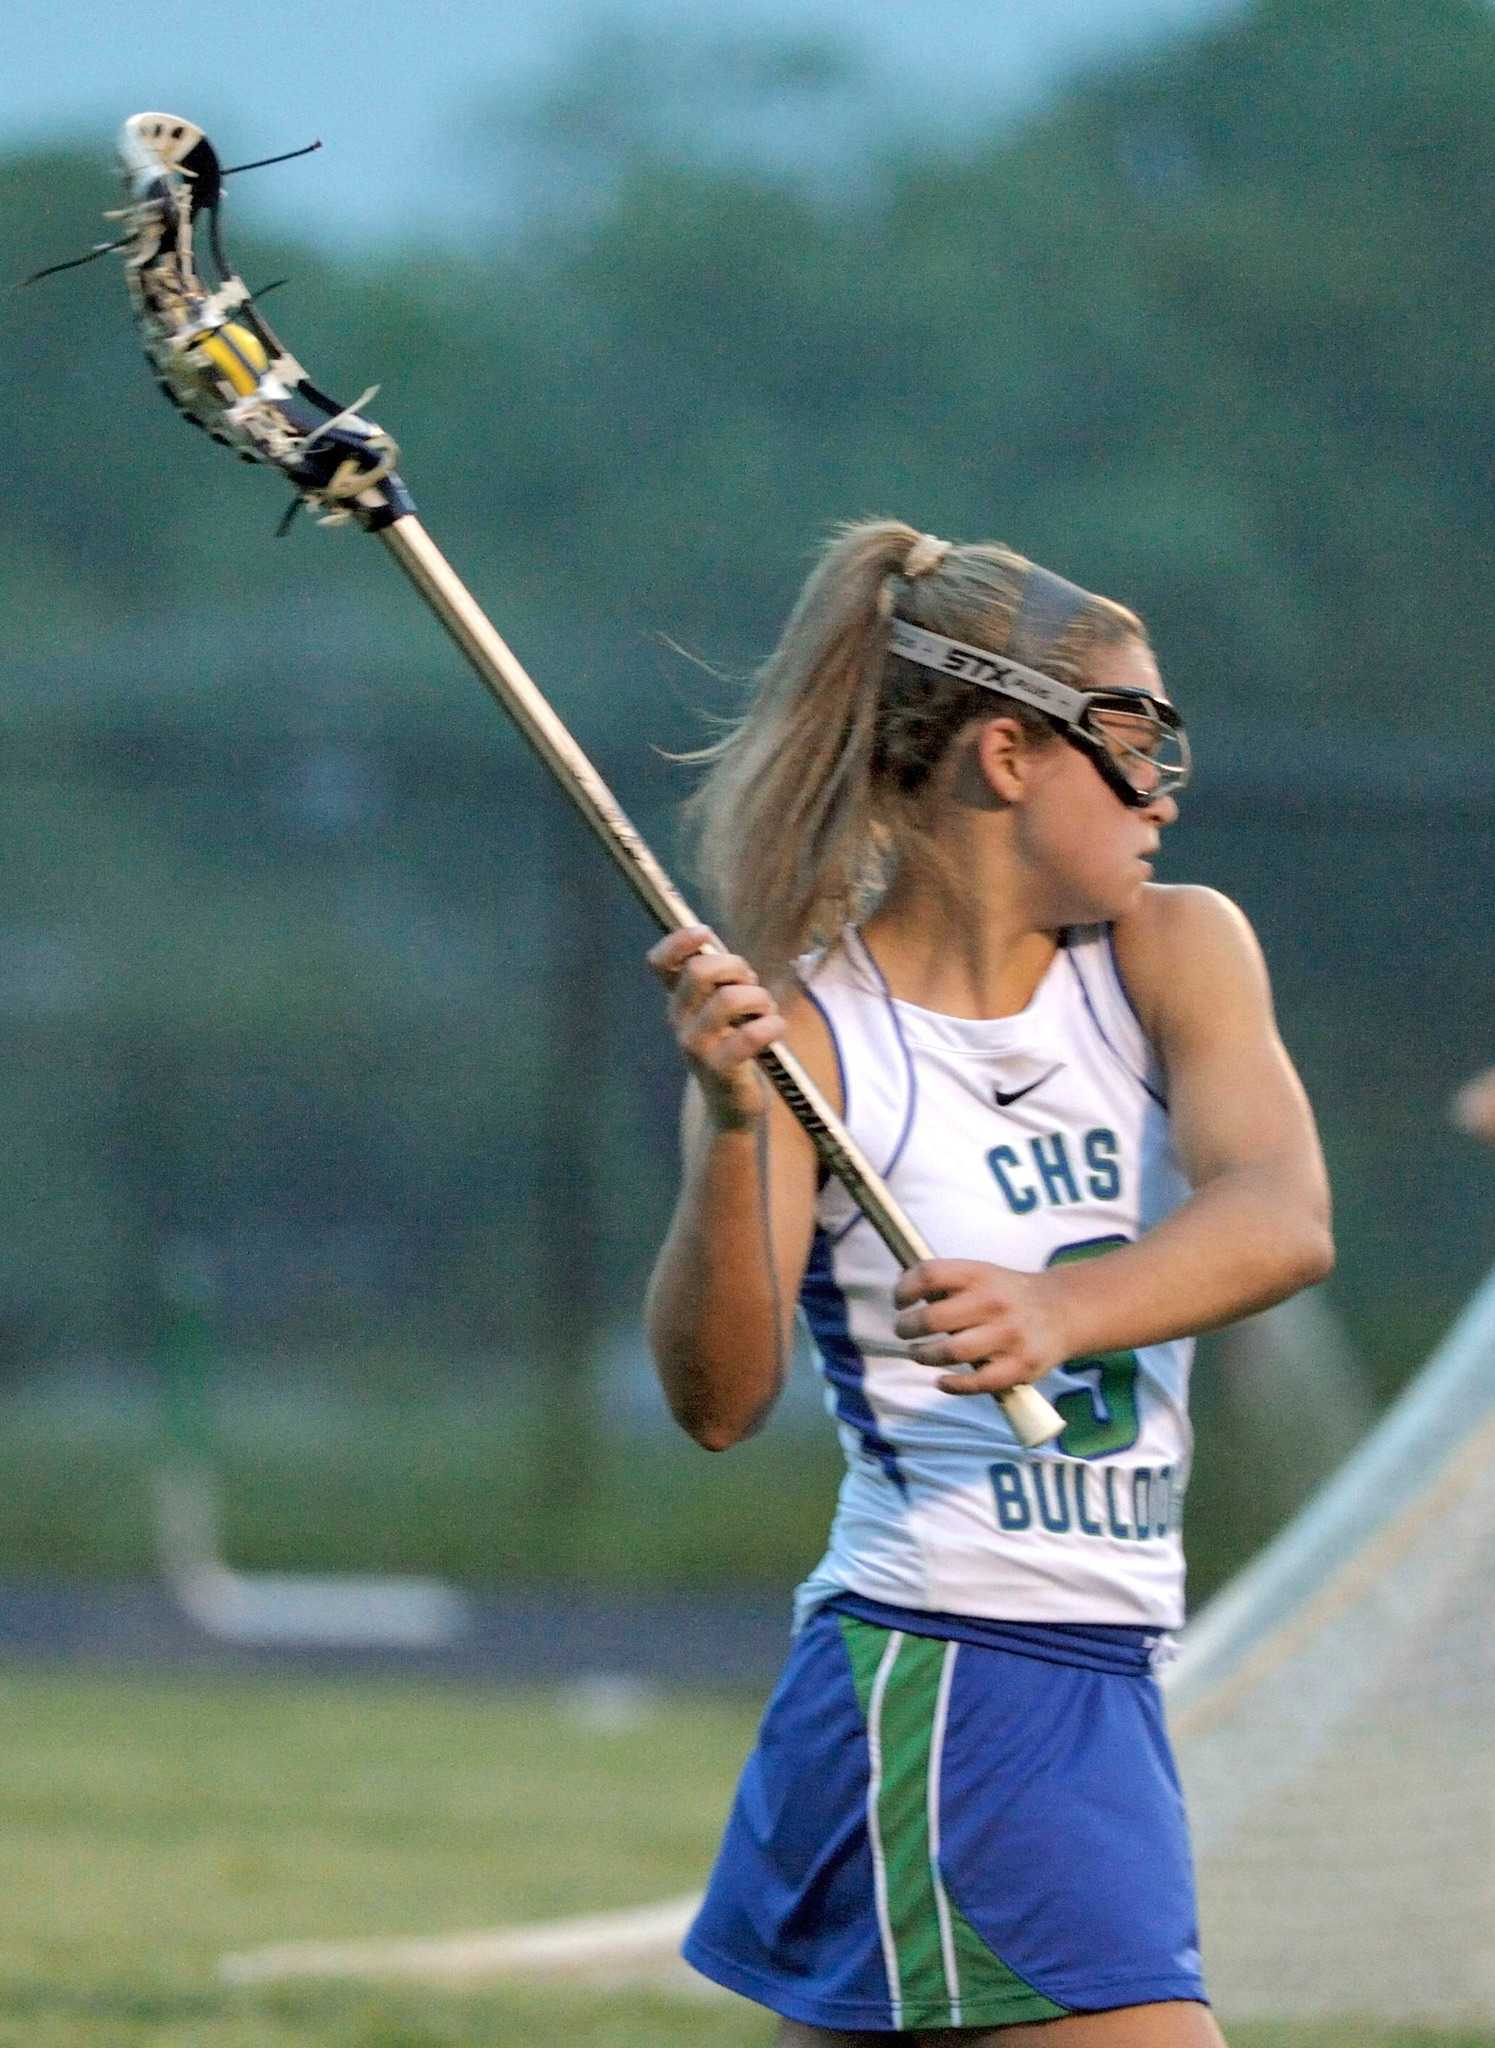 Senior Annie Moshyedi led the girls lacrosse team to a regional championship win over Urbana this season.